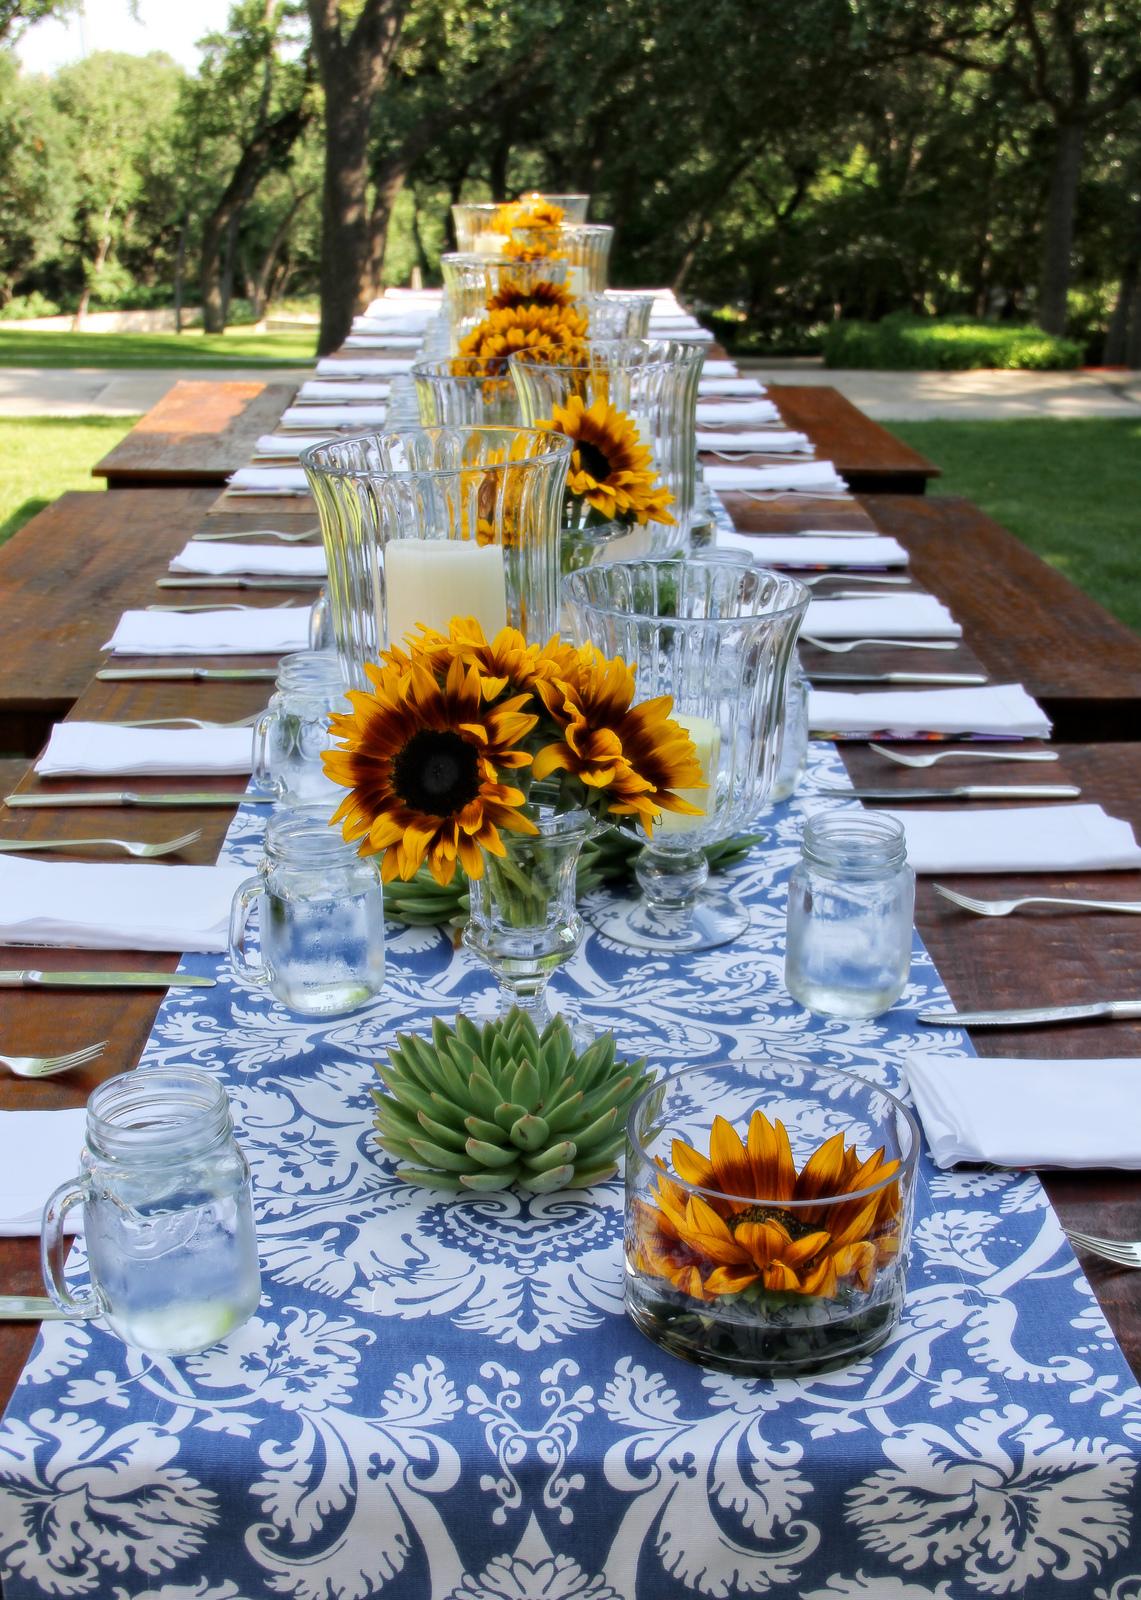 37 Table Decoration Ideas For A Summer Garden Party ... on Backyard Table Decor id=73892